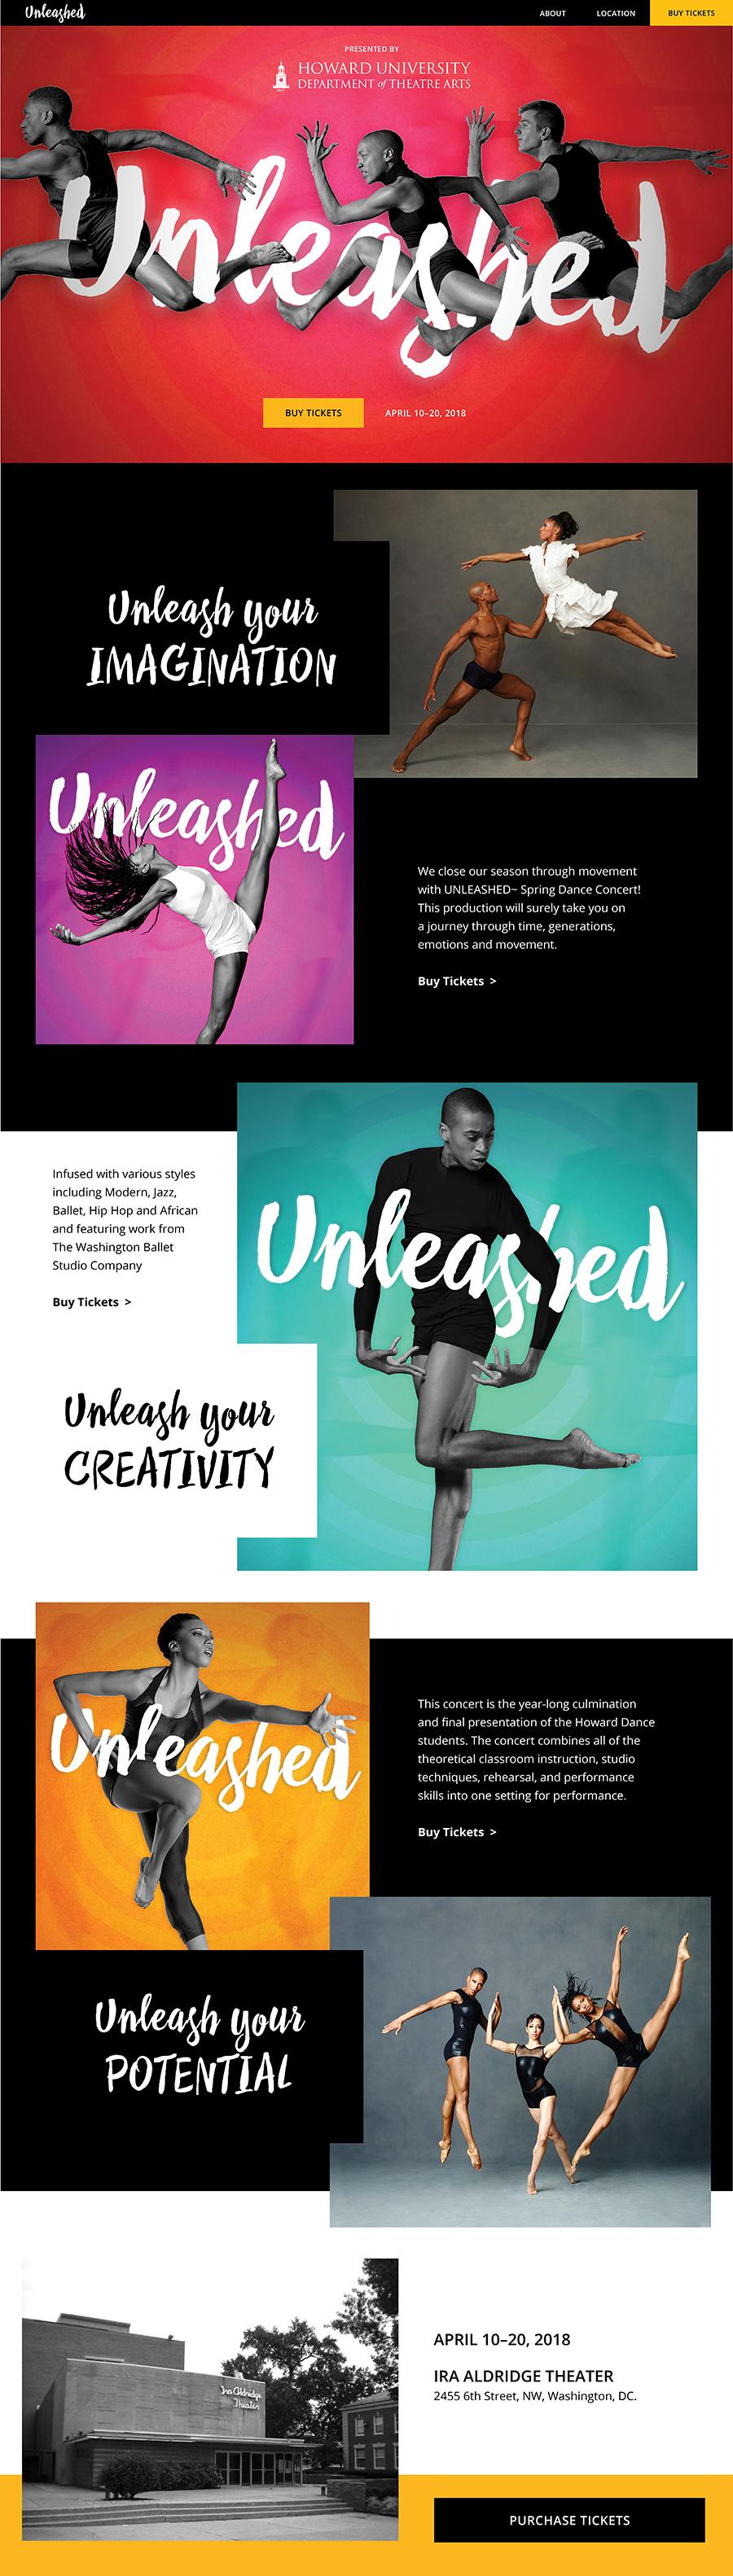 unleashed-dance-showcase-website